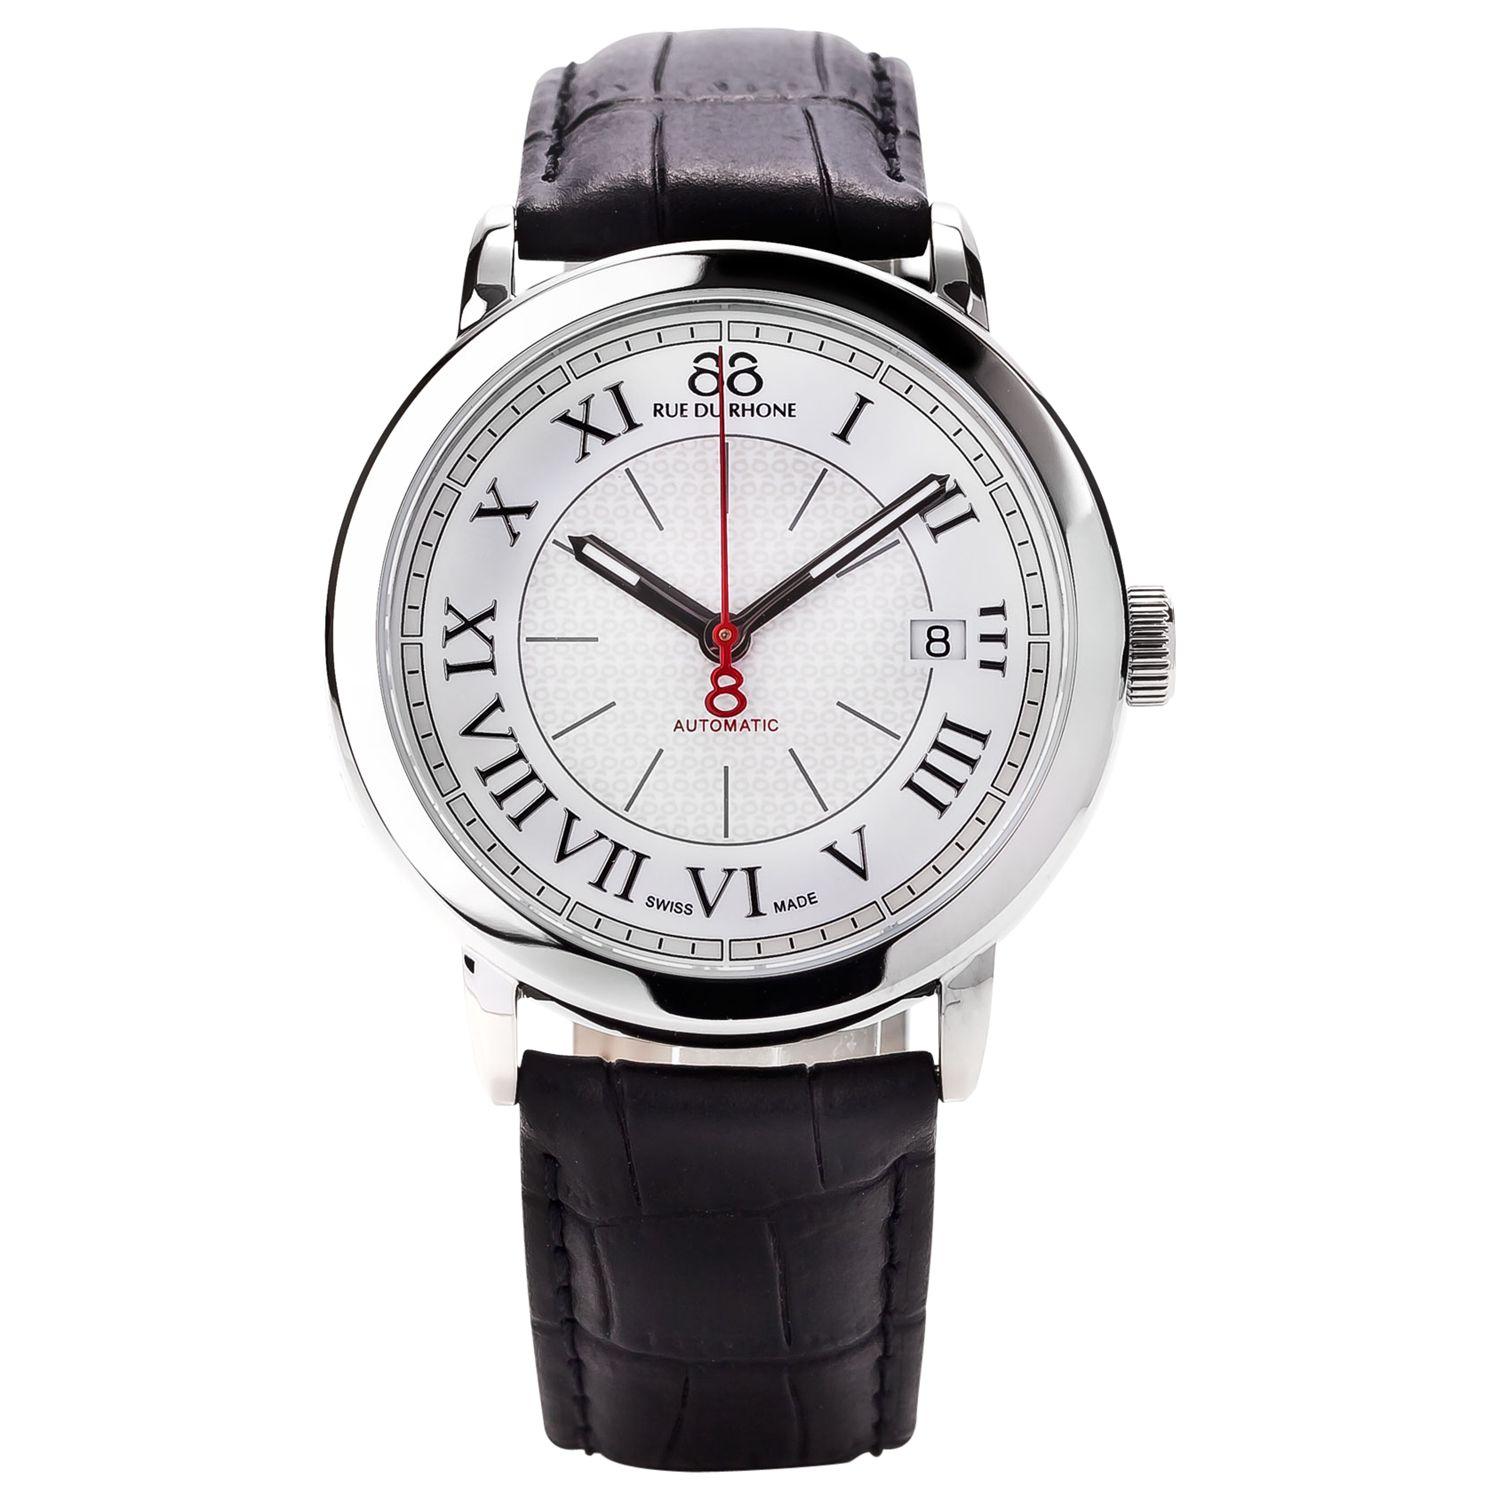 88 Rue Du Rhone 87WA120033 Men's Roman Numeral Leather Strap Watch, Black/Silver